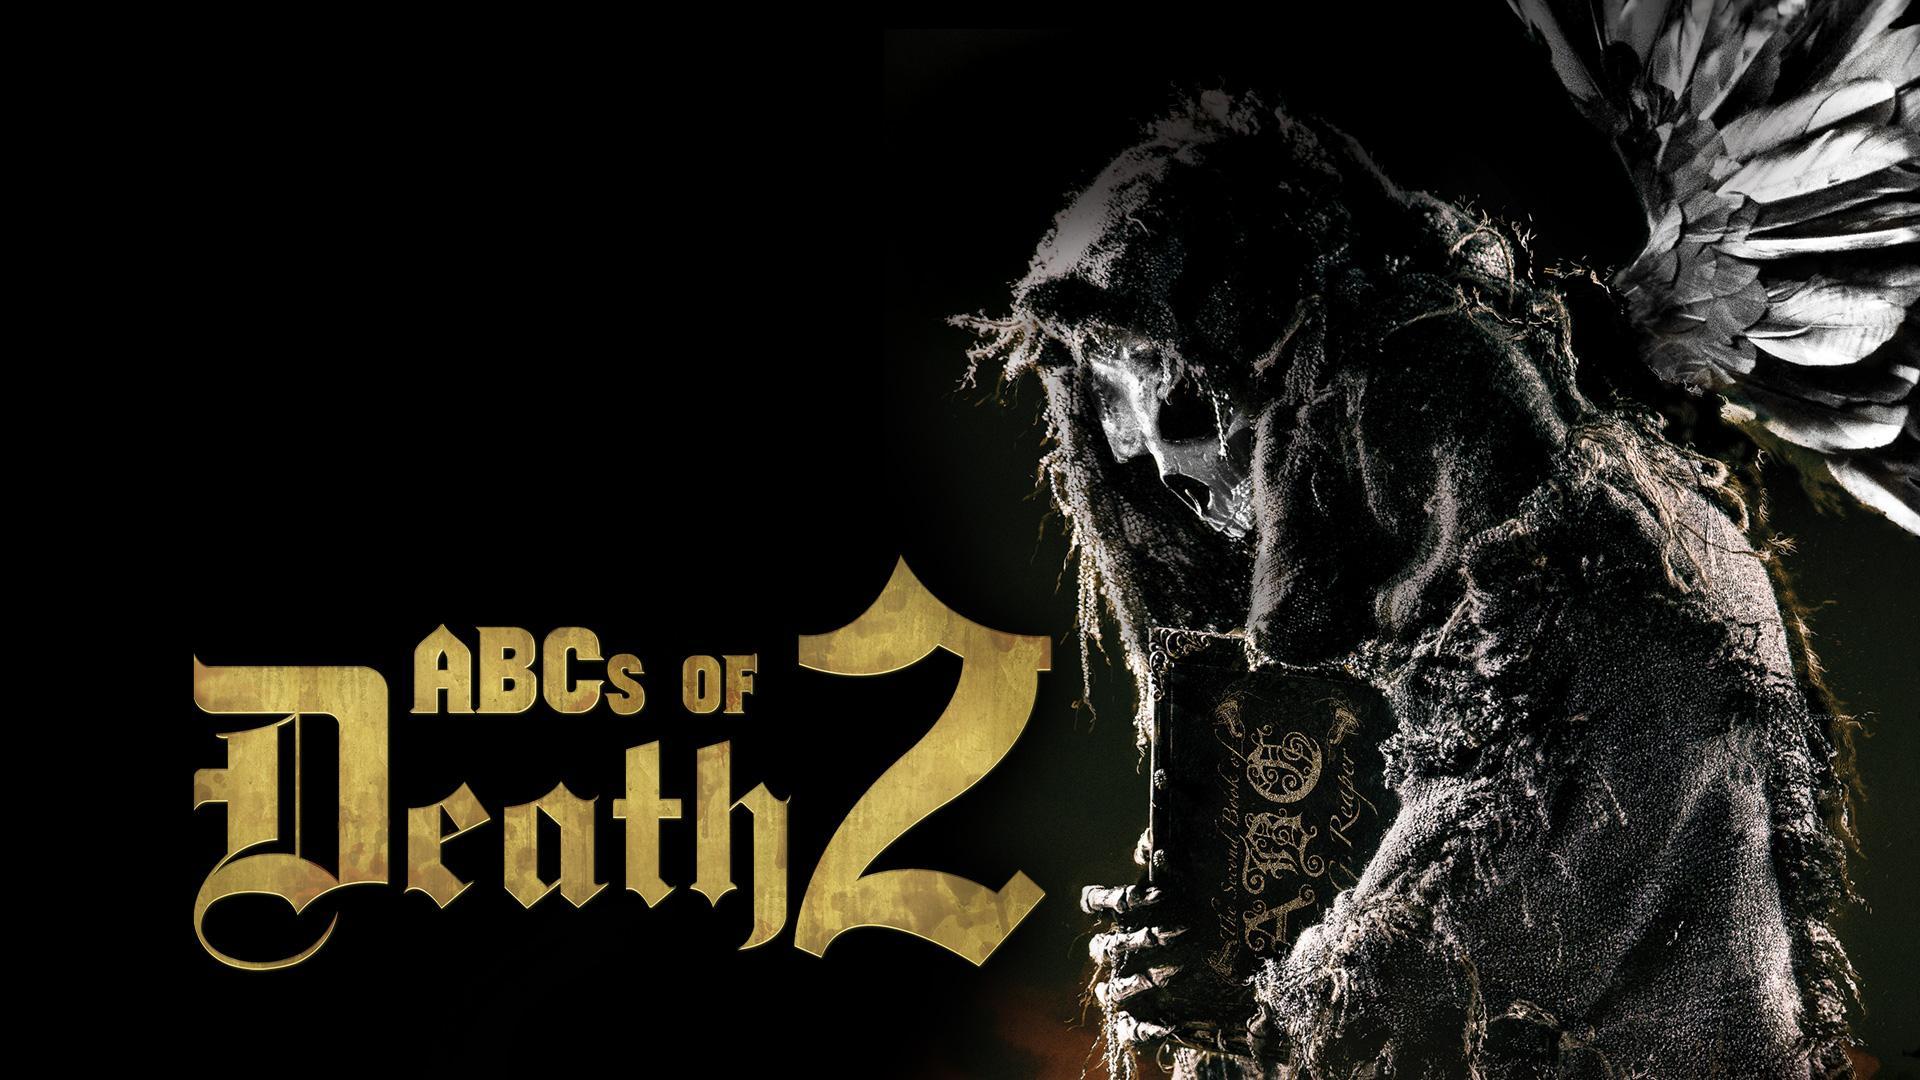 Abc Of Death 2 Stream